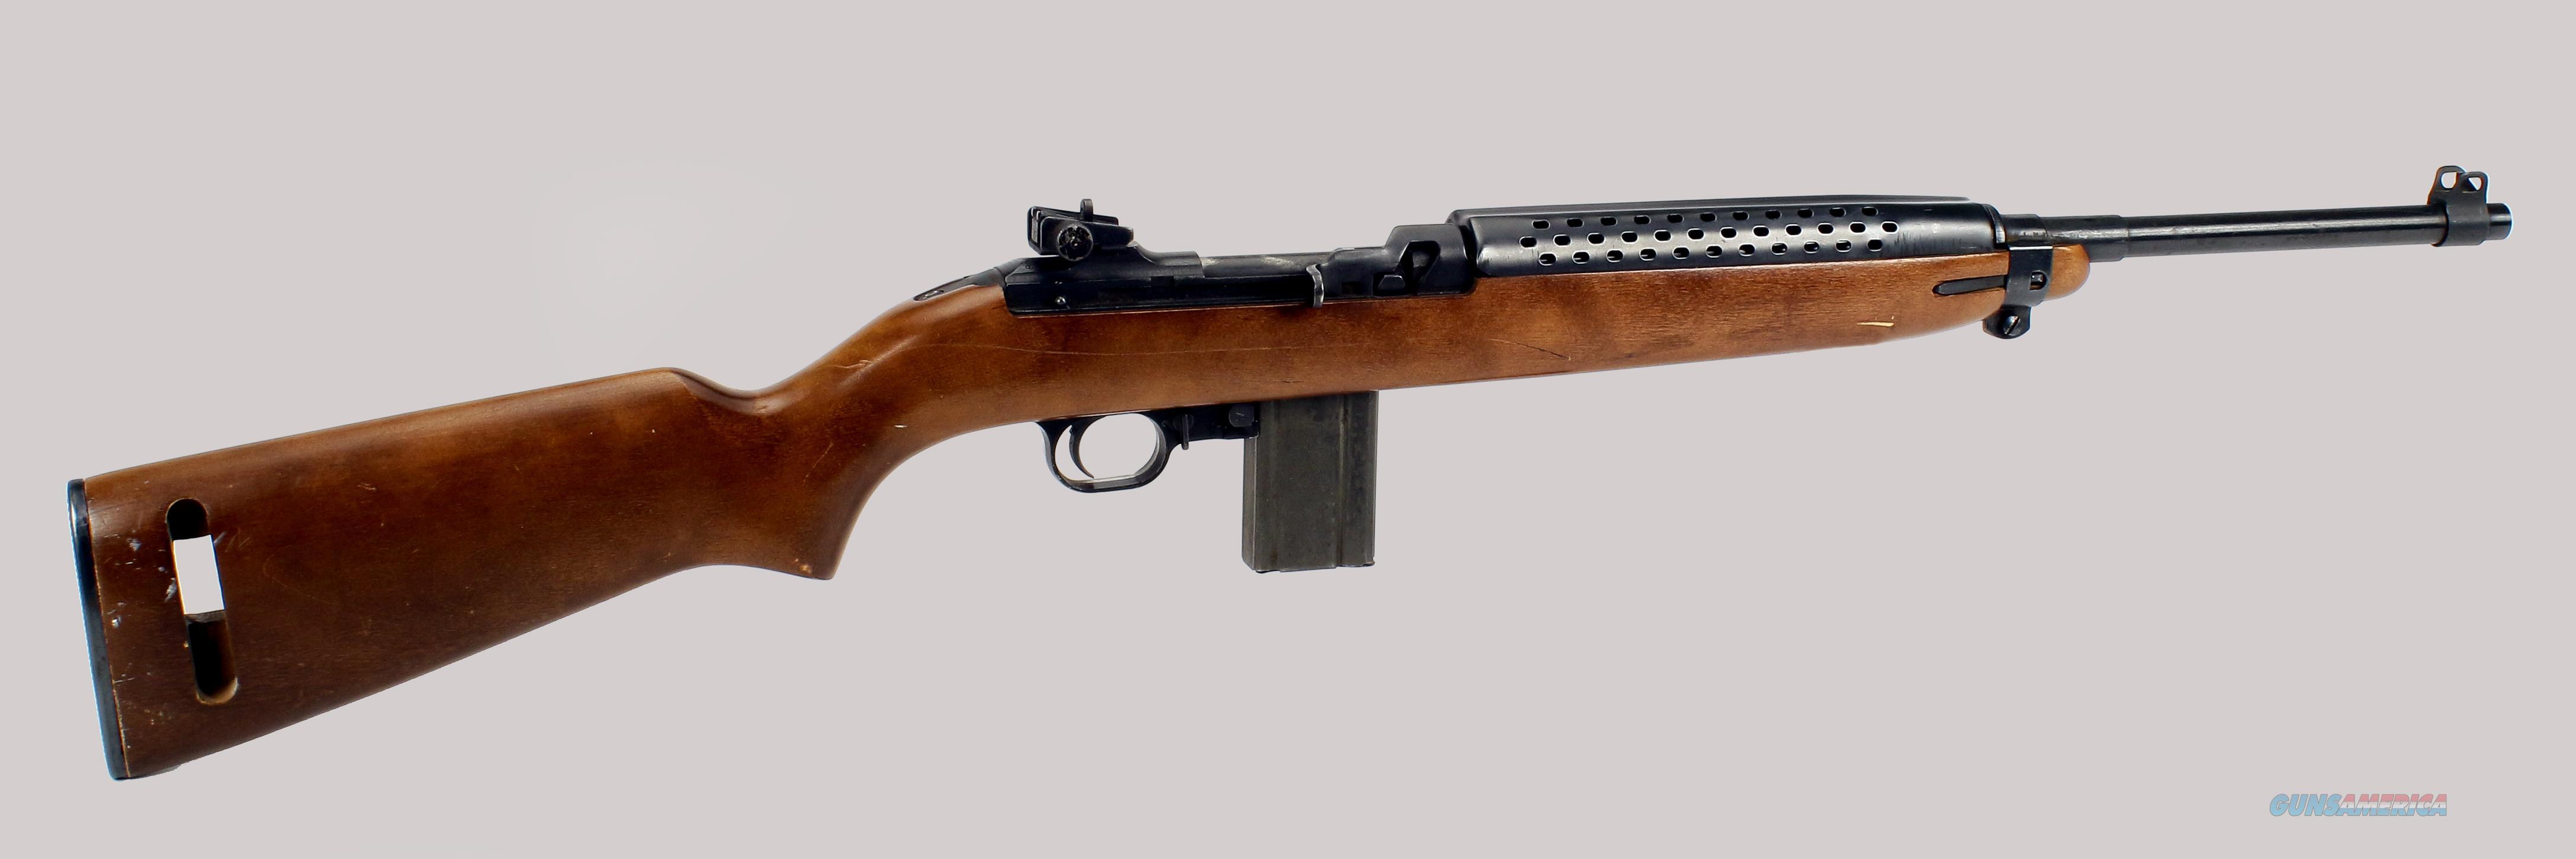 M1: Universal M1 Carbine For Sale